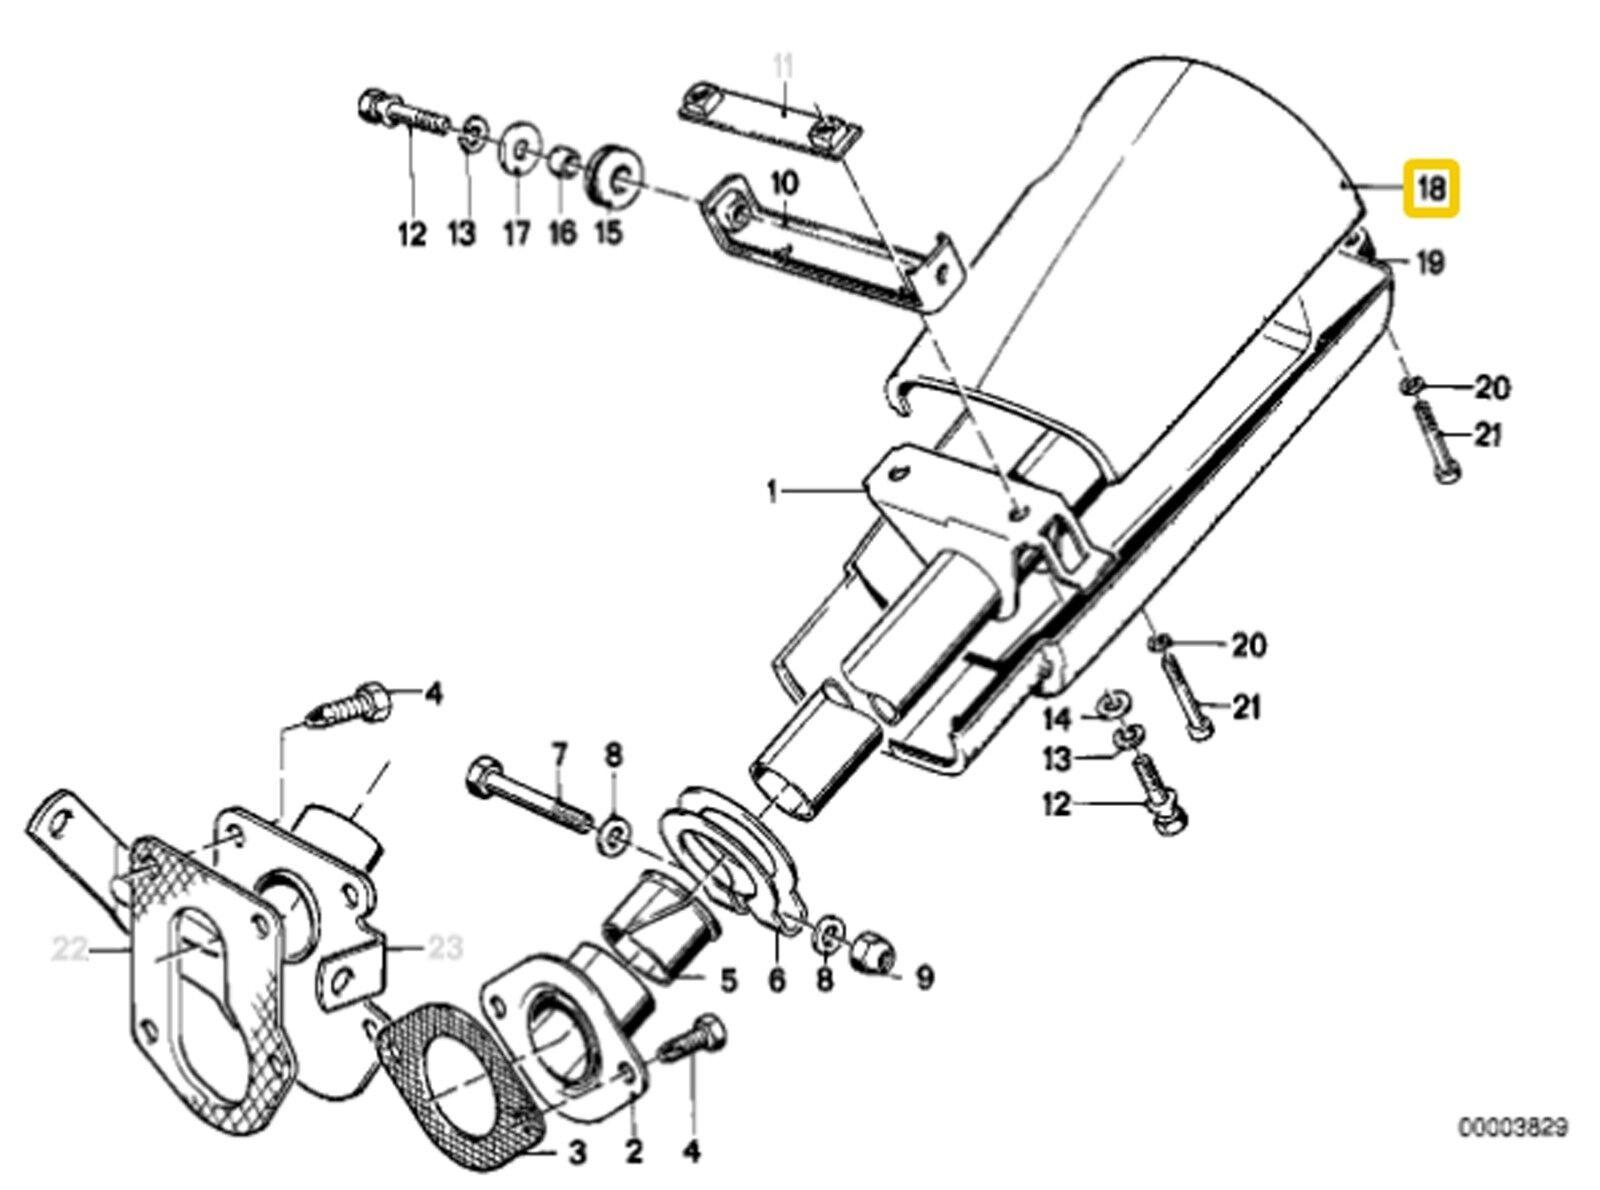 1983 1991 bmw 325i steering column surround trim panel ignition e30 1985 BMW 325E 1983 1991 bmw 325i steering column surround trim panel ignition e30 325 325e 318 ebay